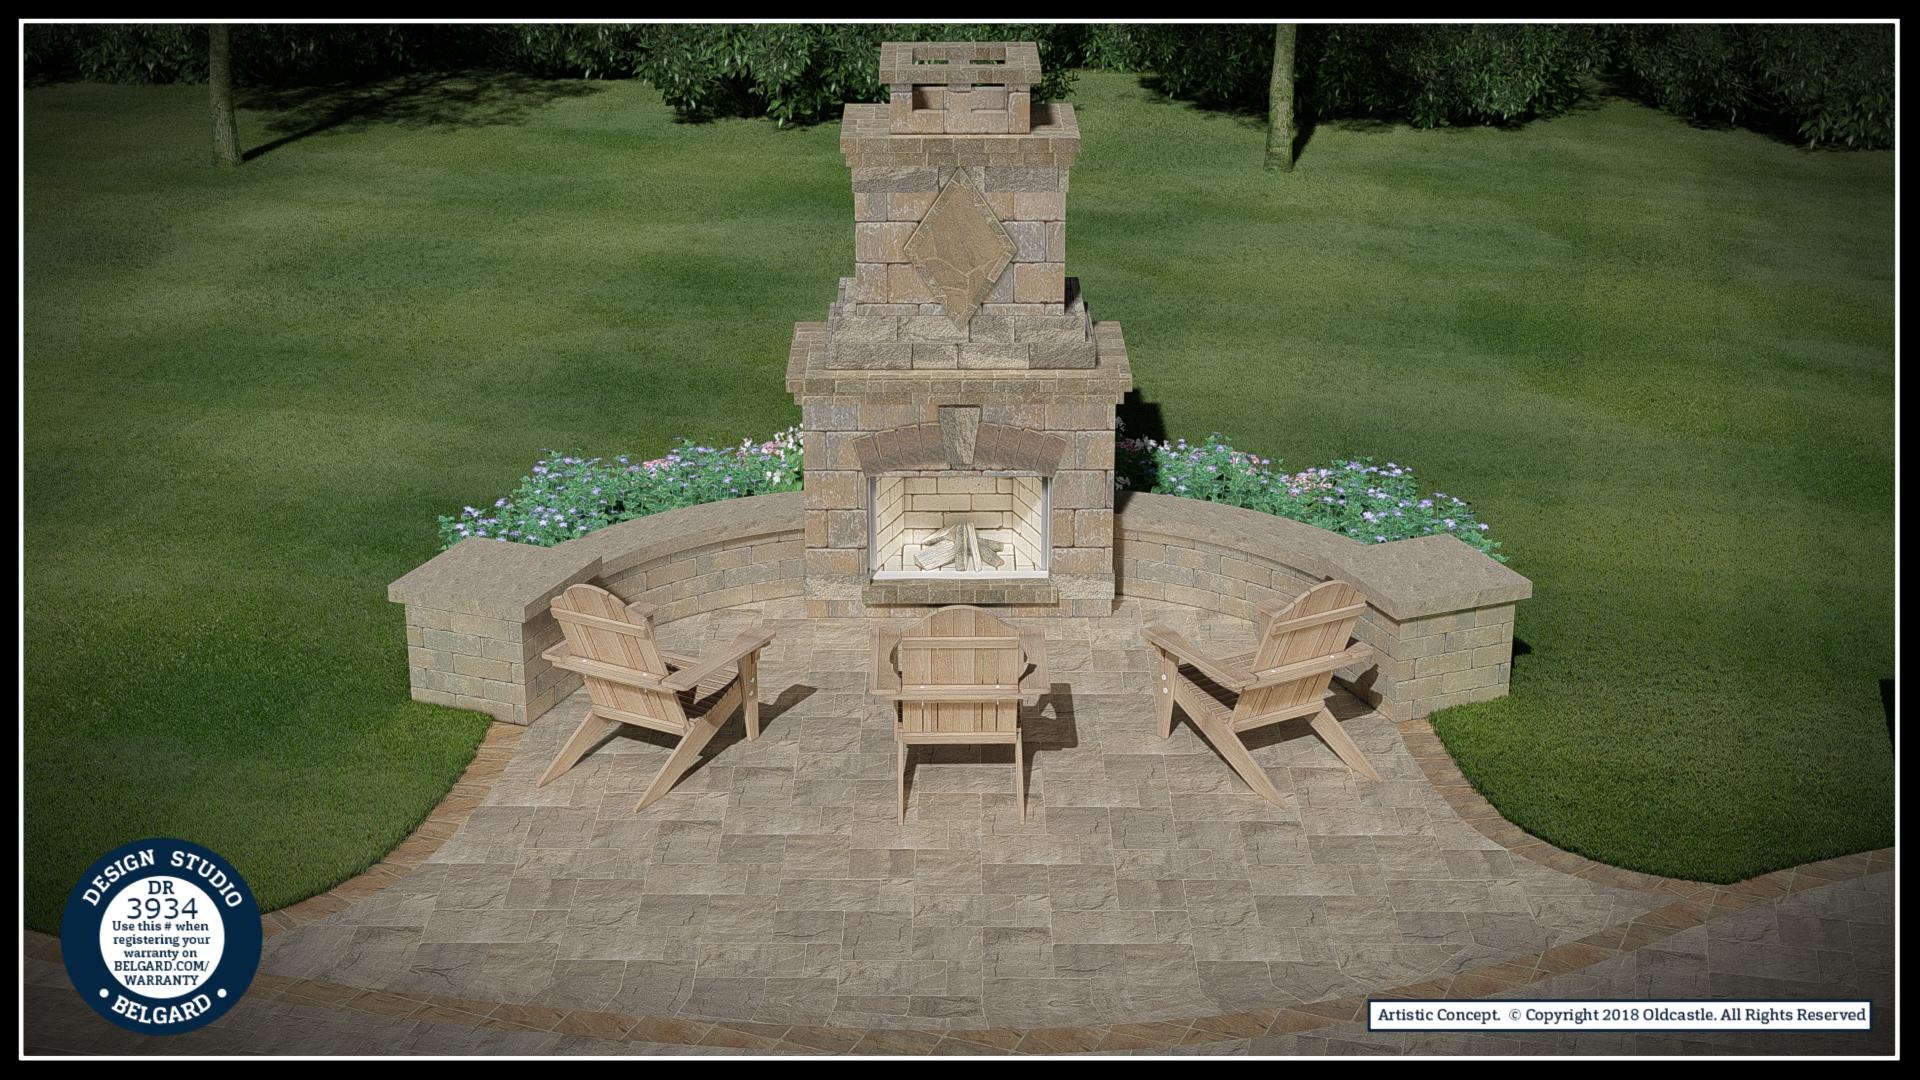 Vosters Landscaping | Firepit | Brick | Hardscape | Outdoor Living | Patio | Belgard | Design Studio | Fireplace